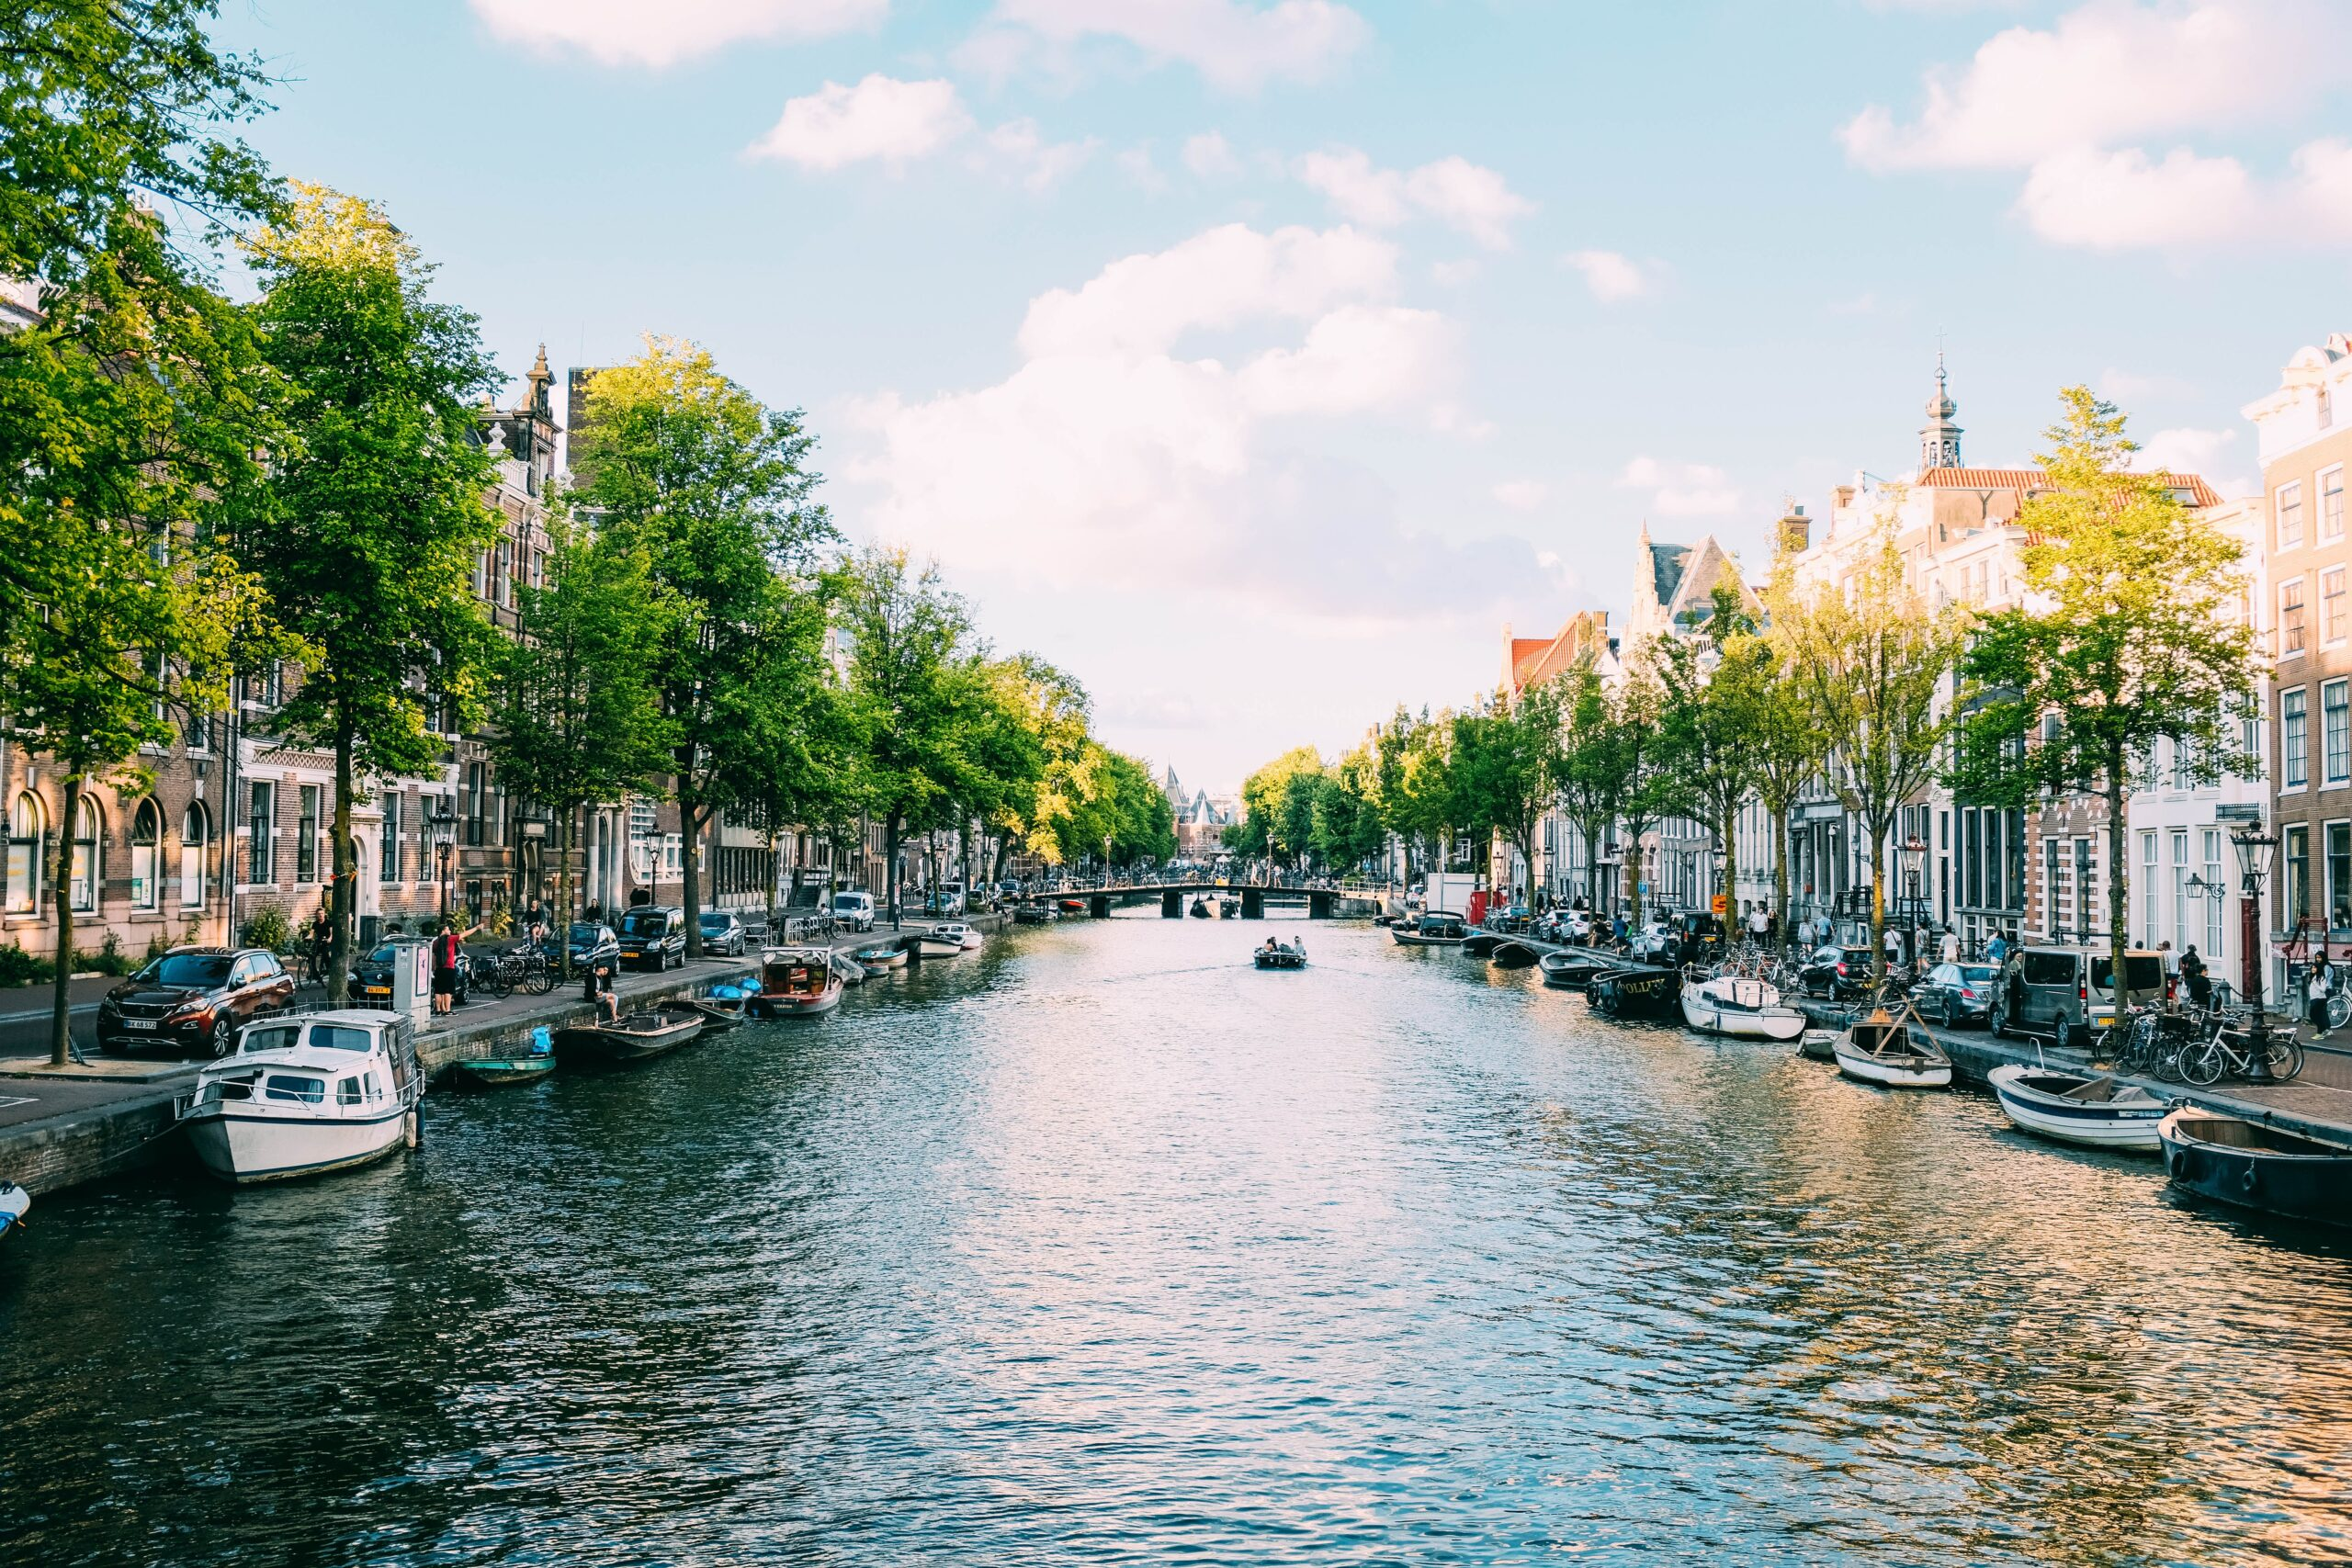 Amsterdam city canal